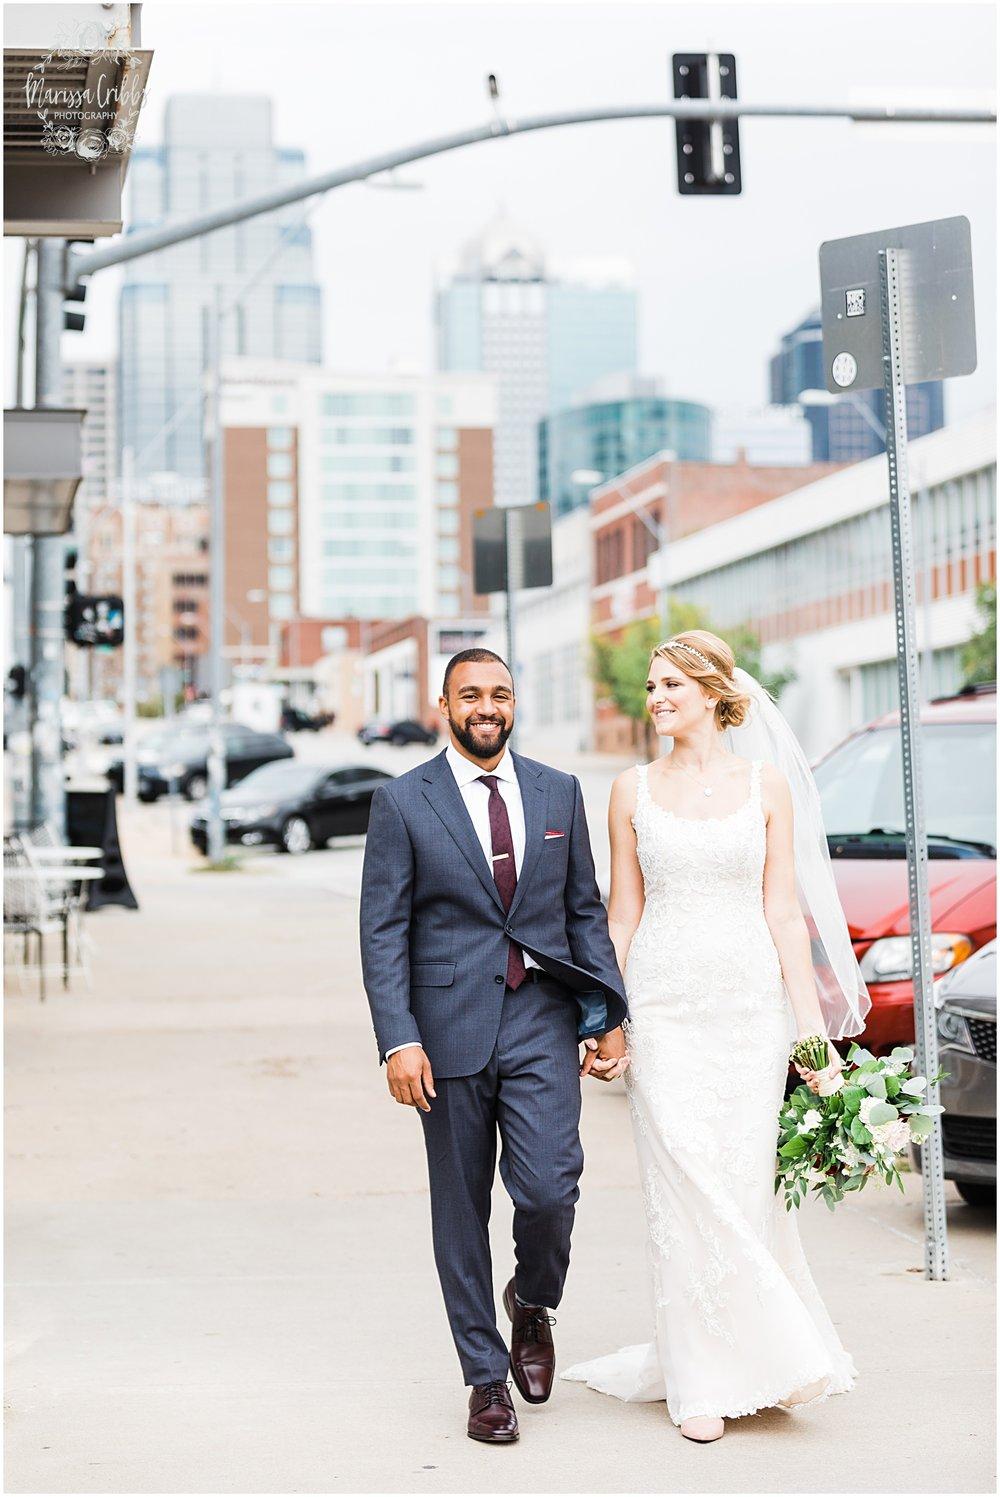 BAUER WEDDING | KELSEA & JUSTIN | MARISSA CRIBBS PHOTOGRAPHY_6532.jpg